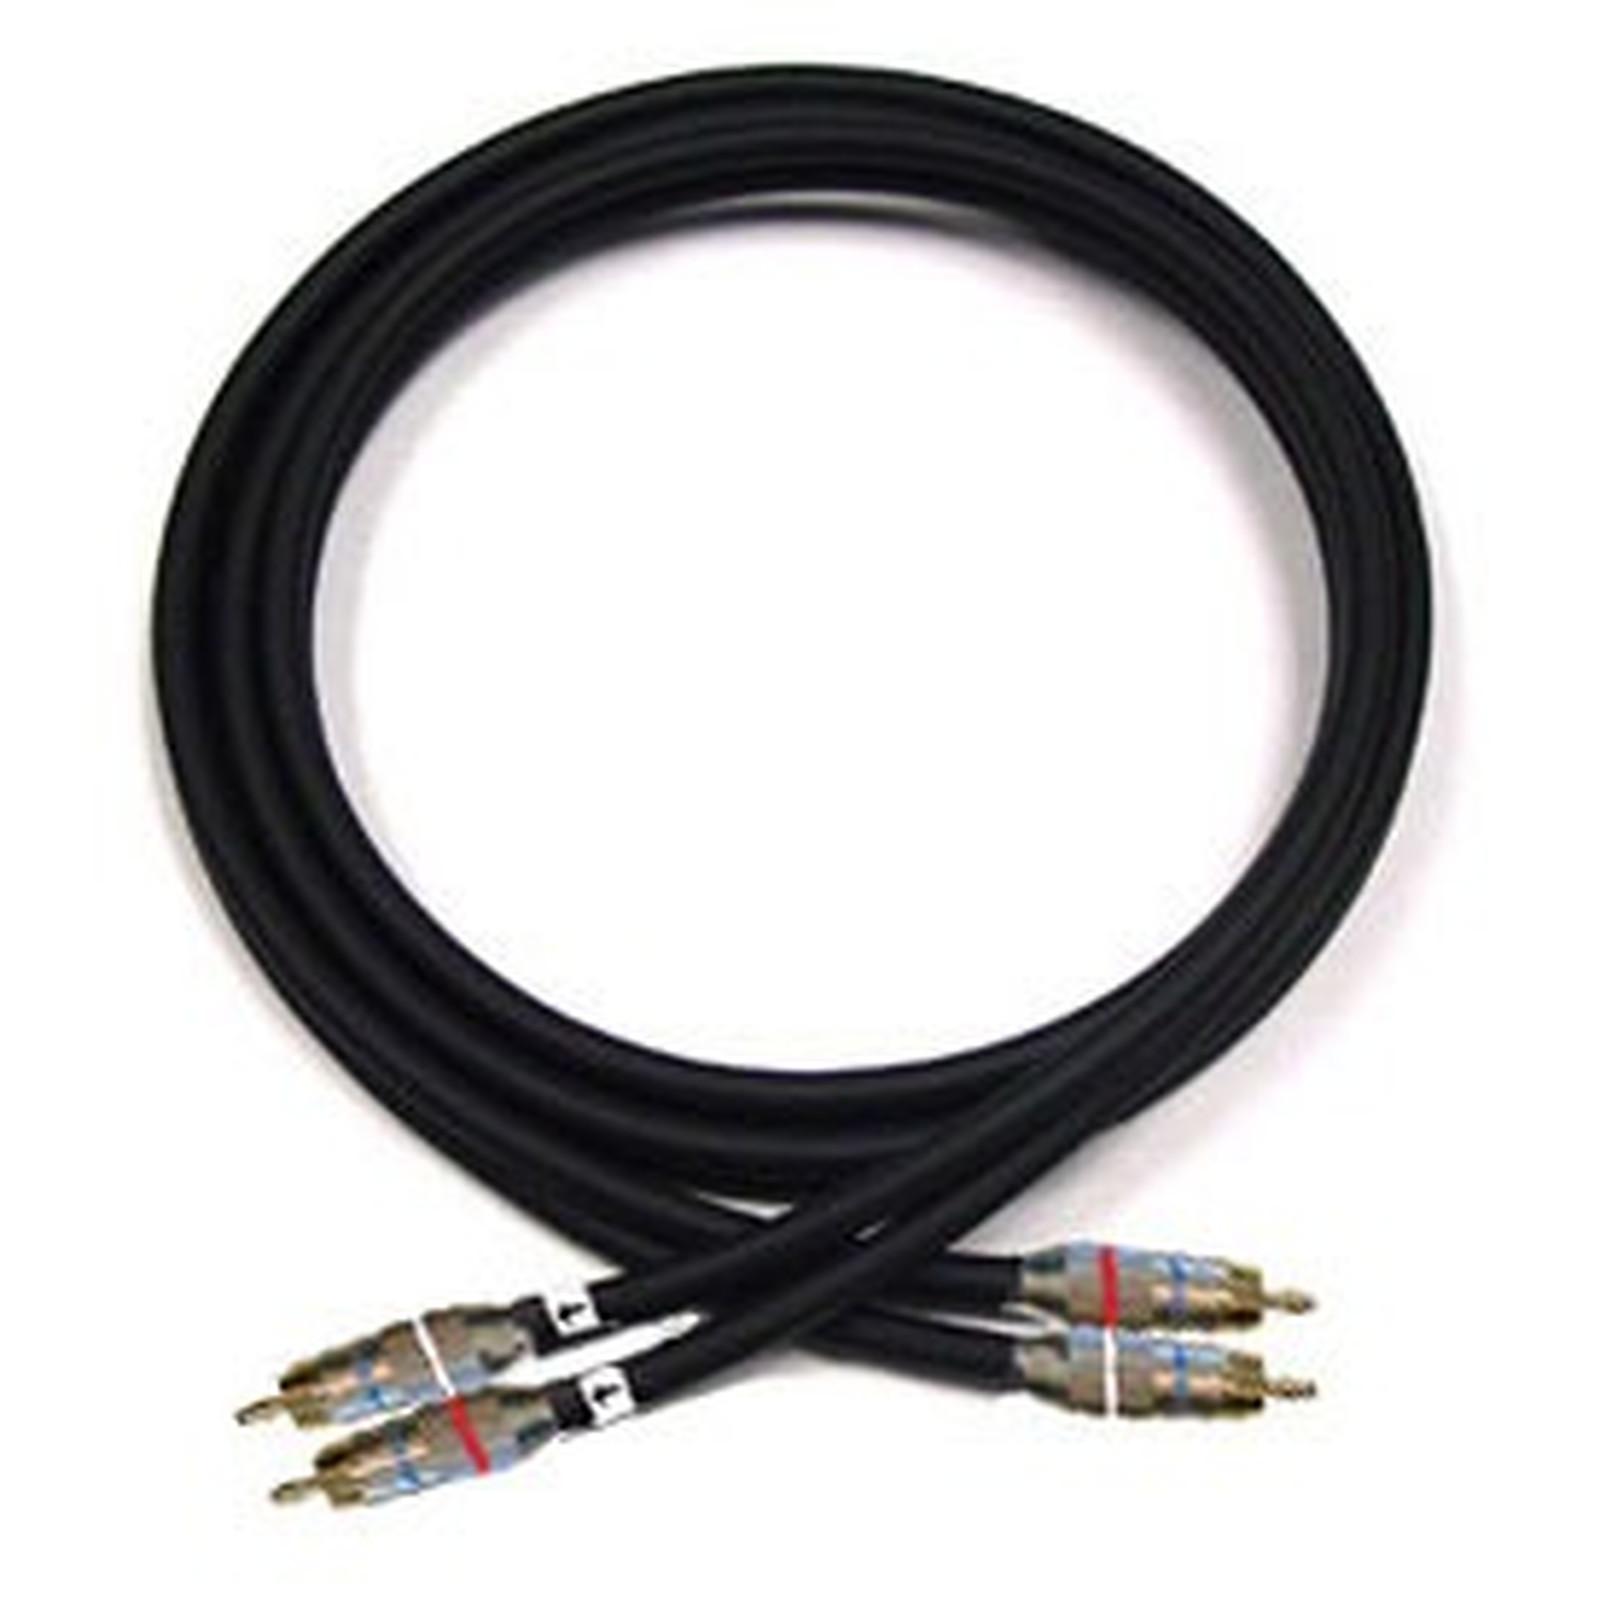 Accell UltraAudio Câble RCA stéréo 1.5 m